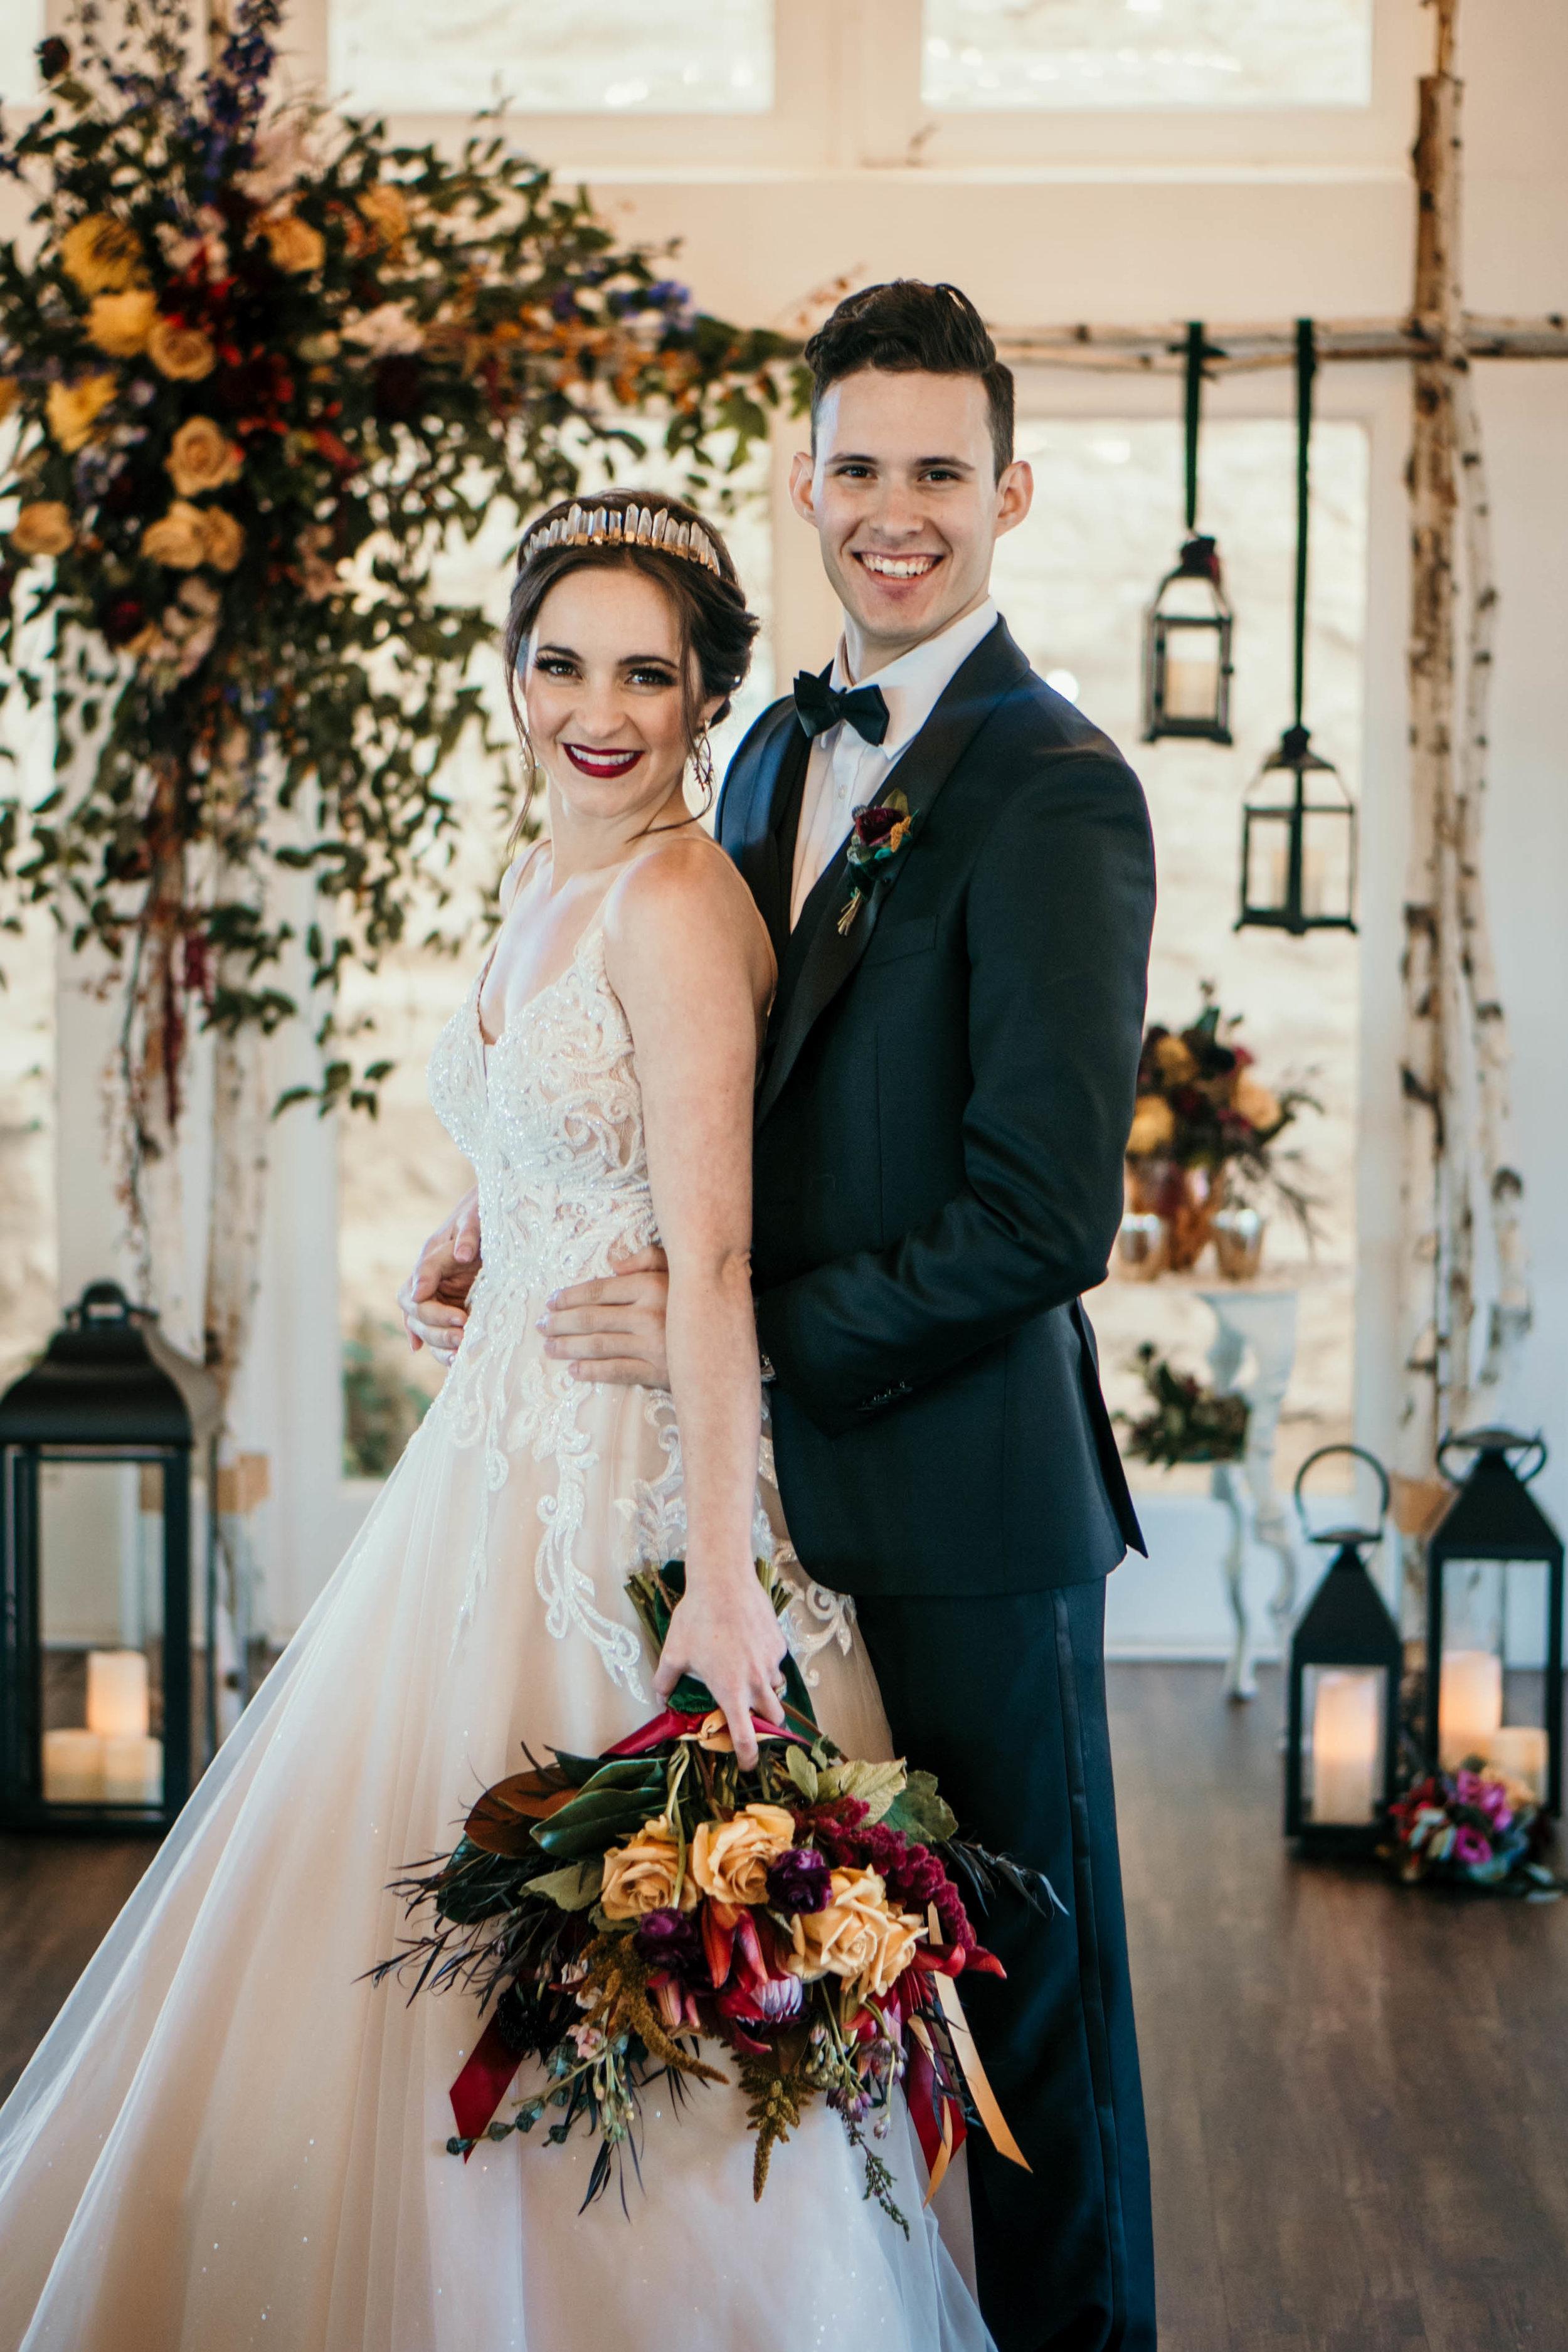 Austin Wedding Videographer - Dolls for Dolls (268 of 323).jpg